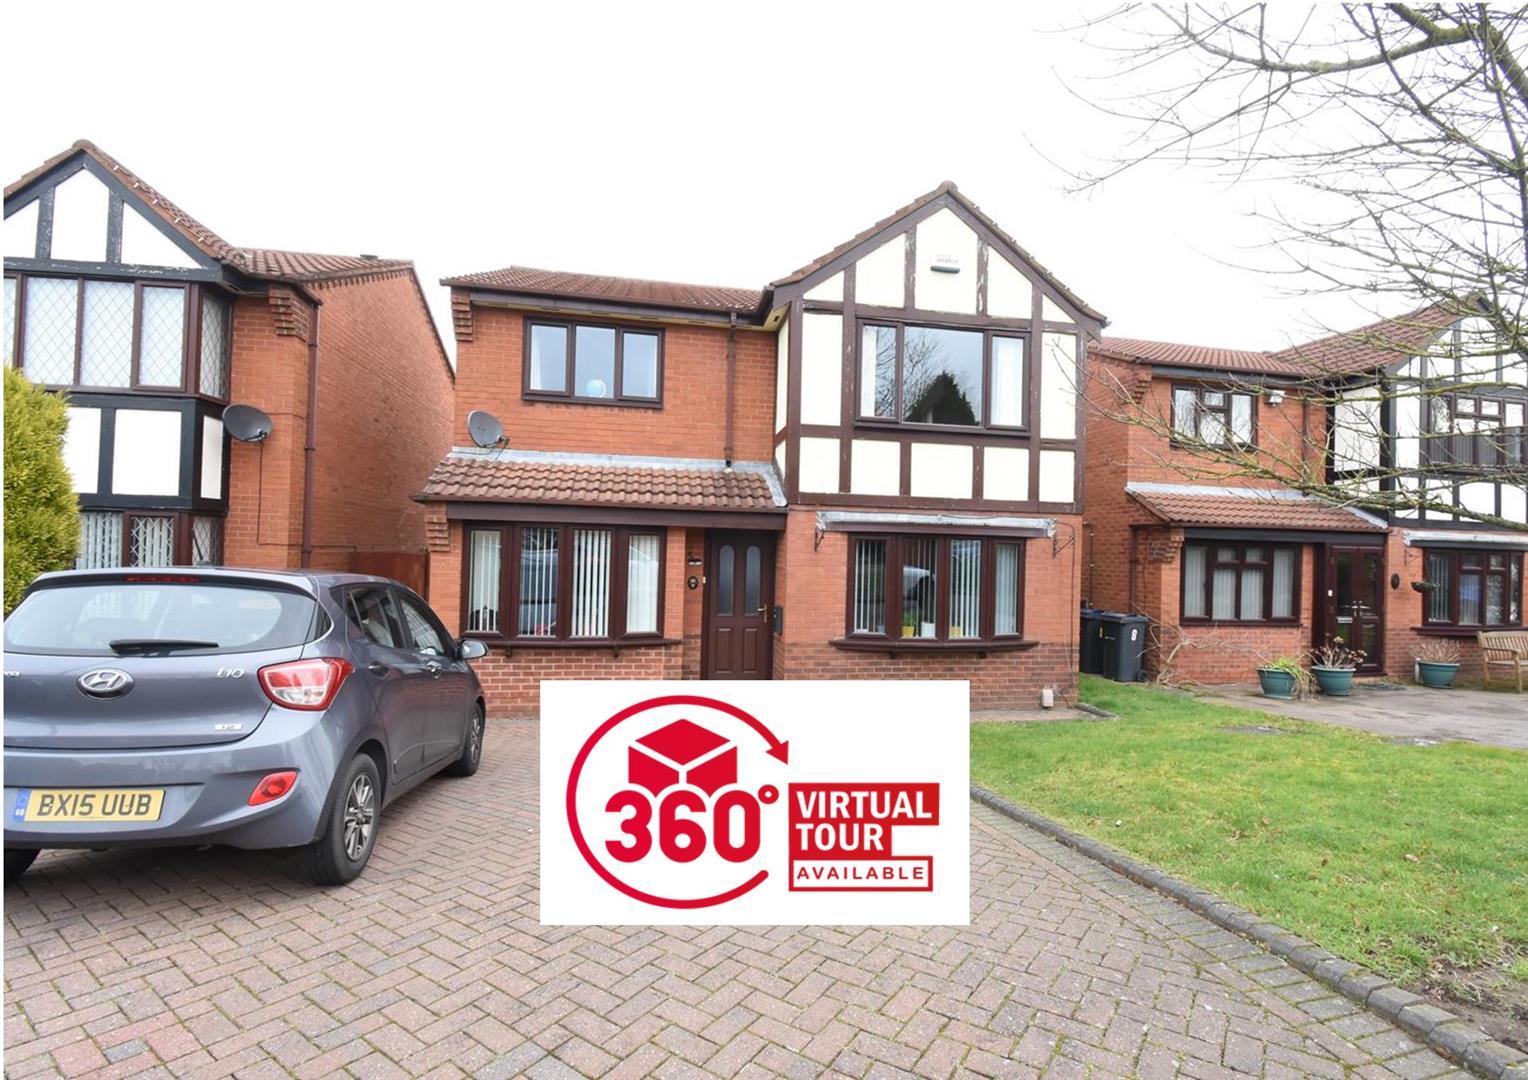 3 bed house for sale in Wilkinson Croft, Birmingham, B8